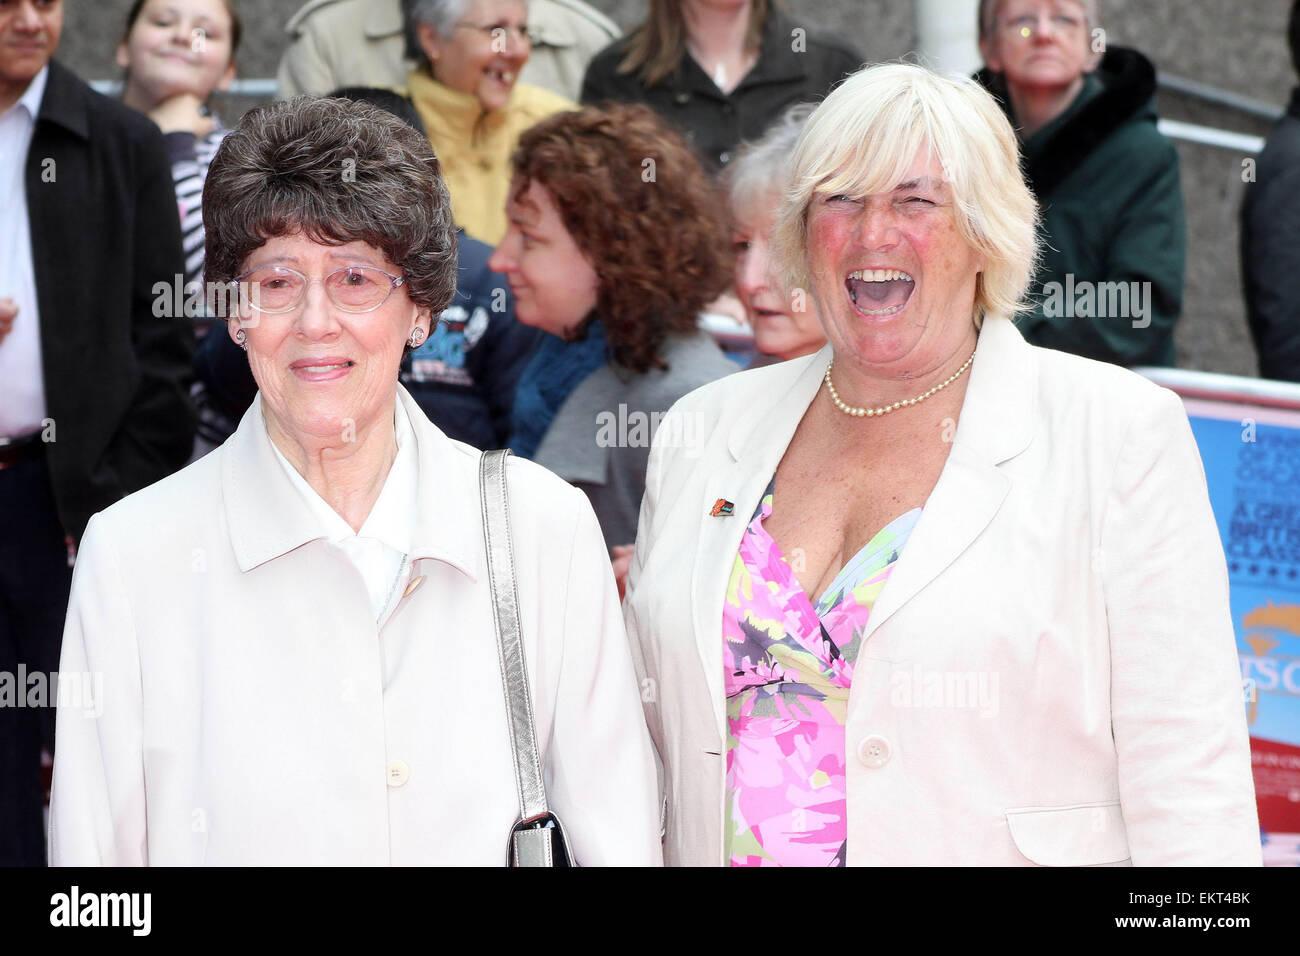 10.JULY.2012. EDINBURGH  'CHARIOTS OF FIRE' FILM PREMIERE IN EDINBURGH - Stock Image